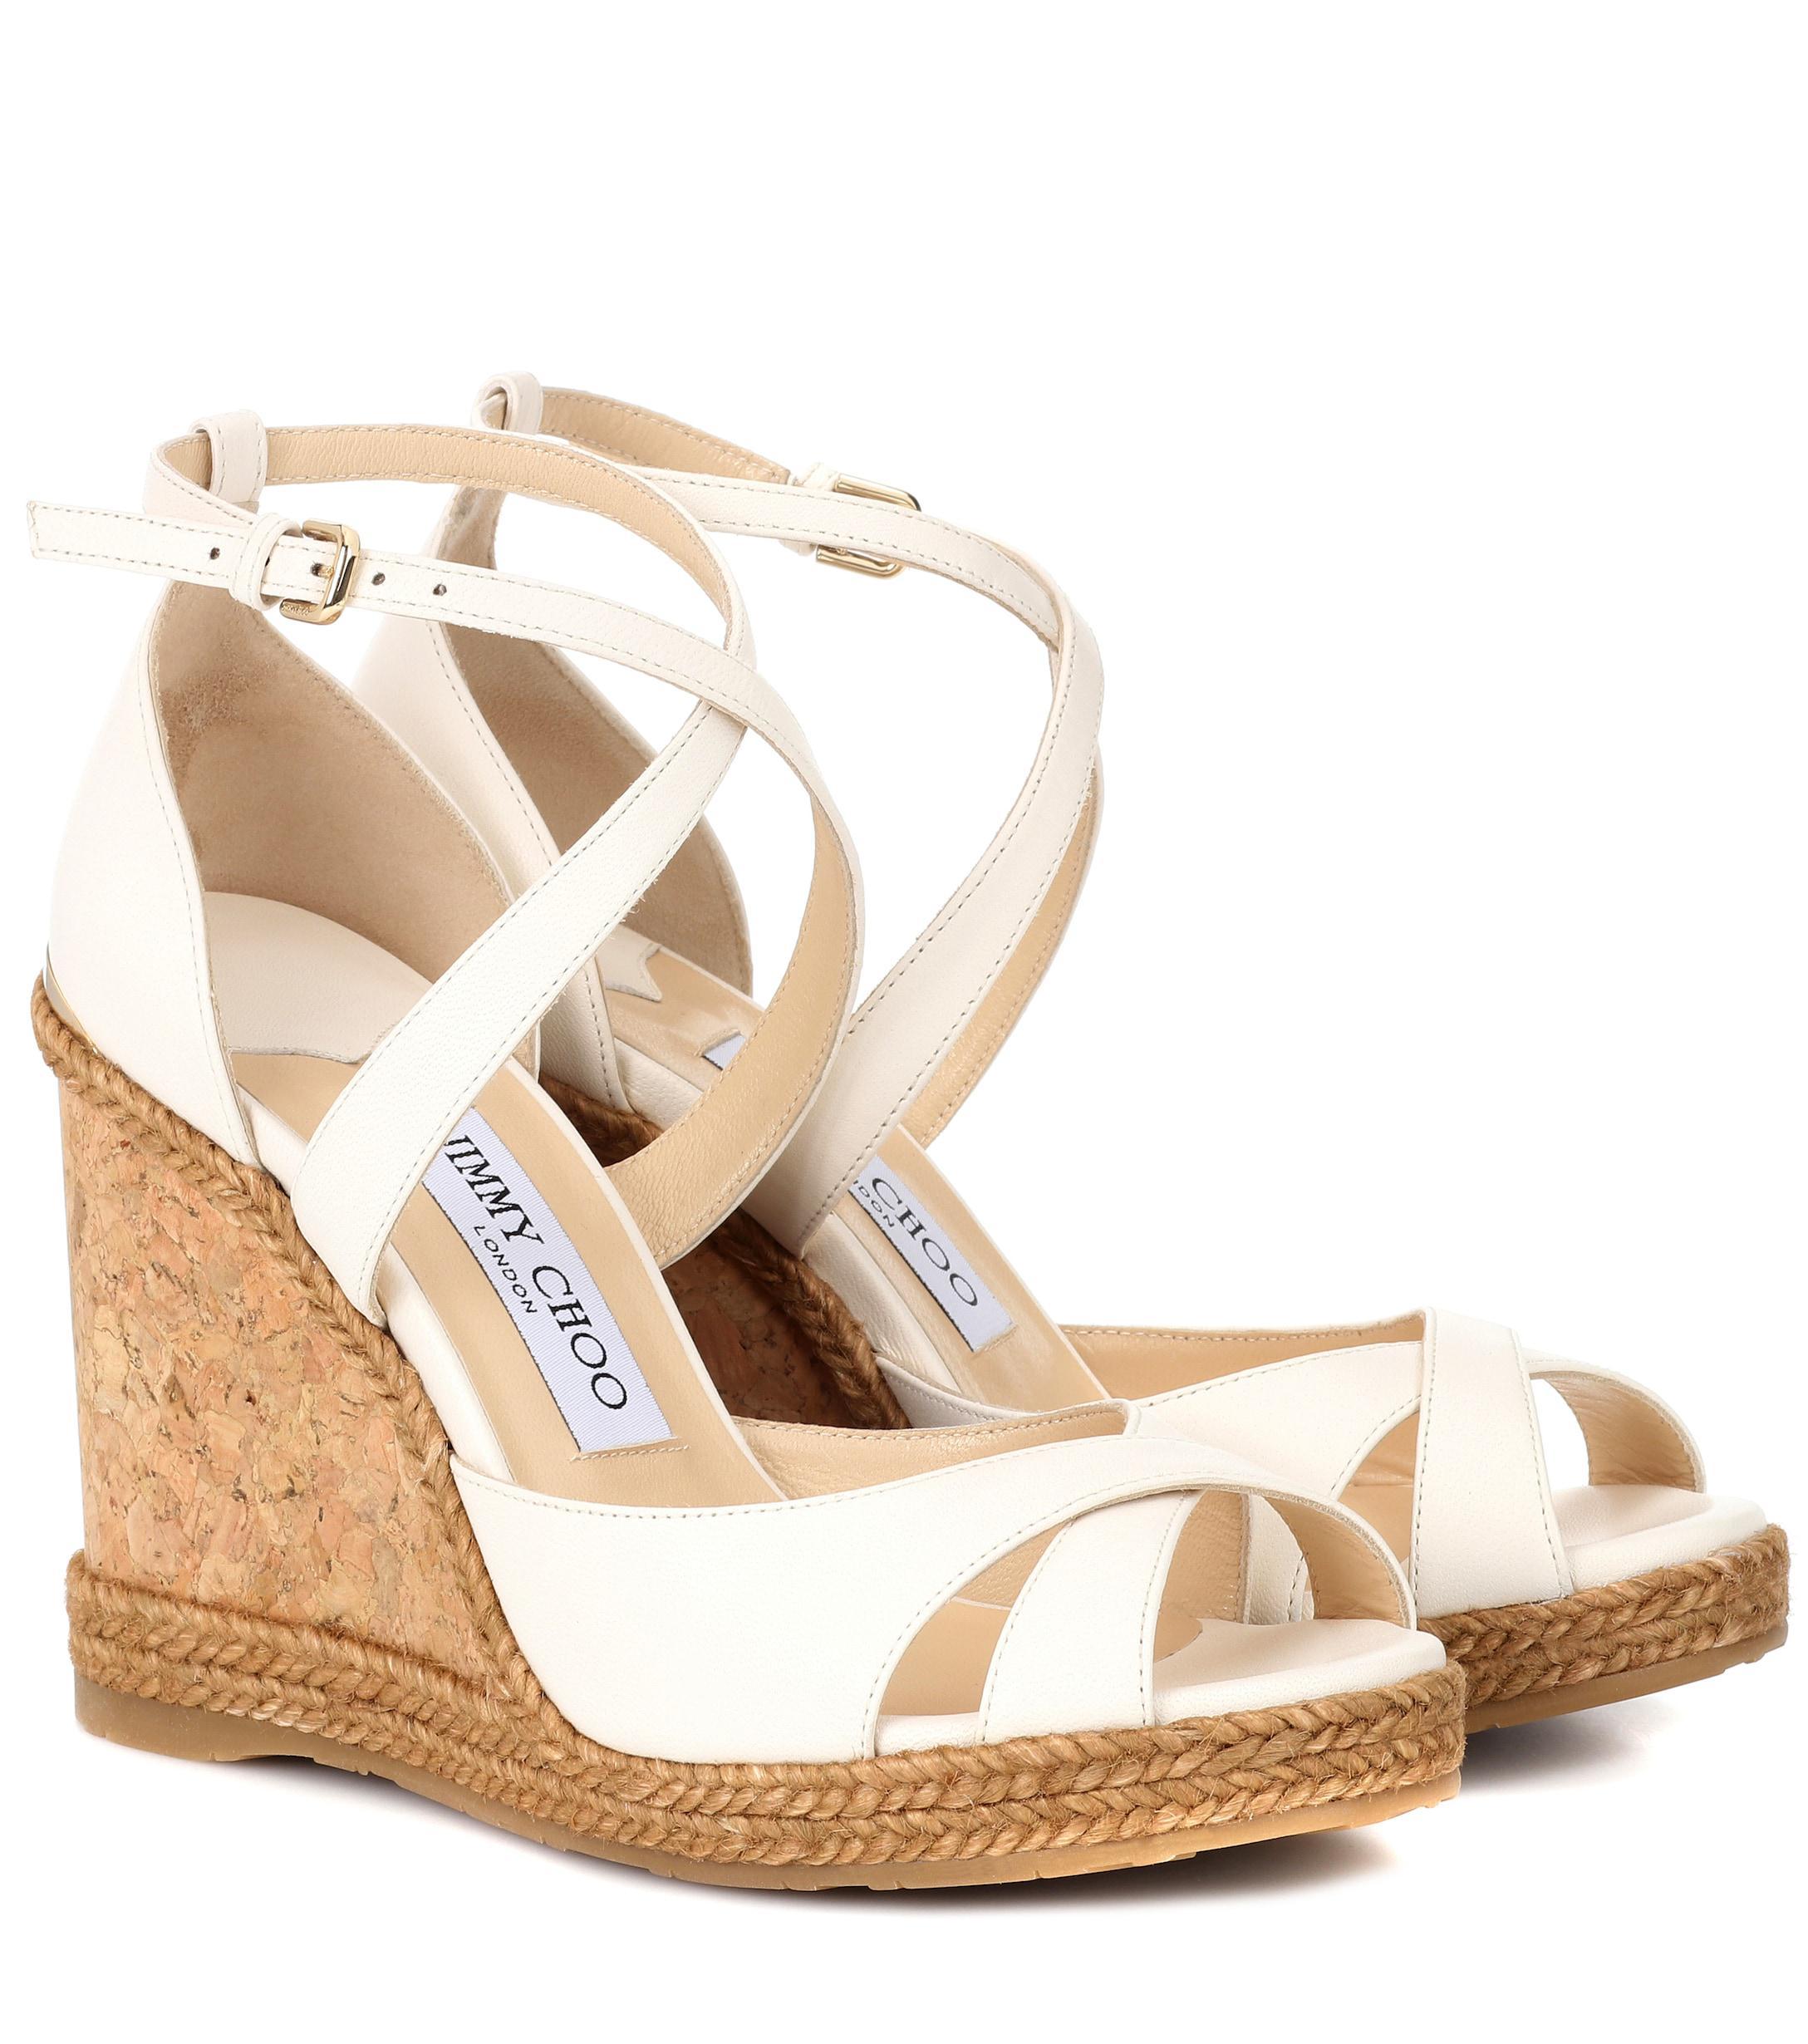 6a5a8eddd8d3 Jimmy Choo Alanah 105 Platform Sandals - Save 42% - Lyst